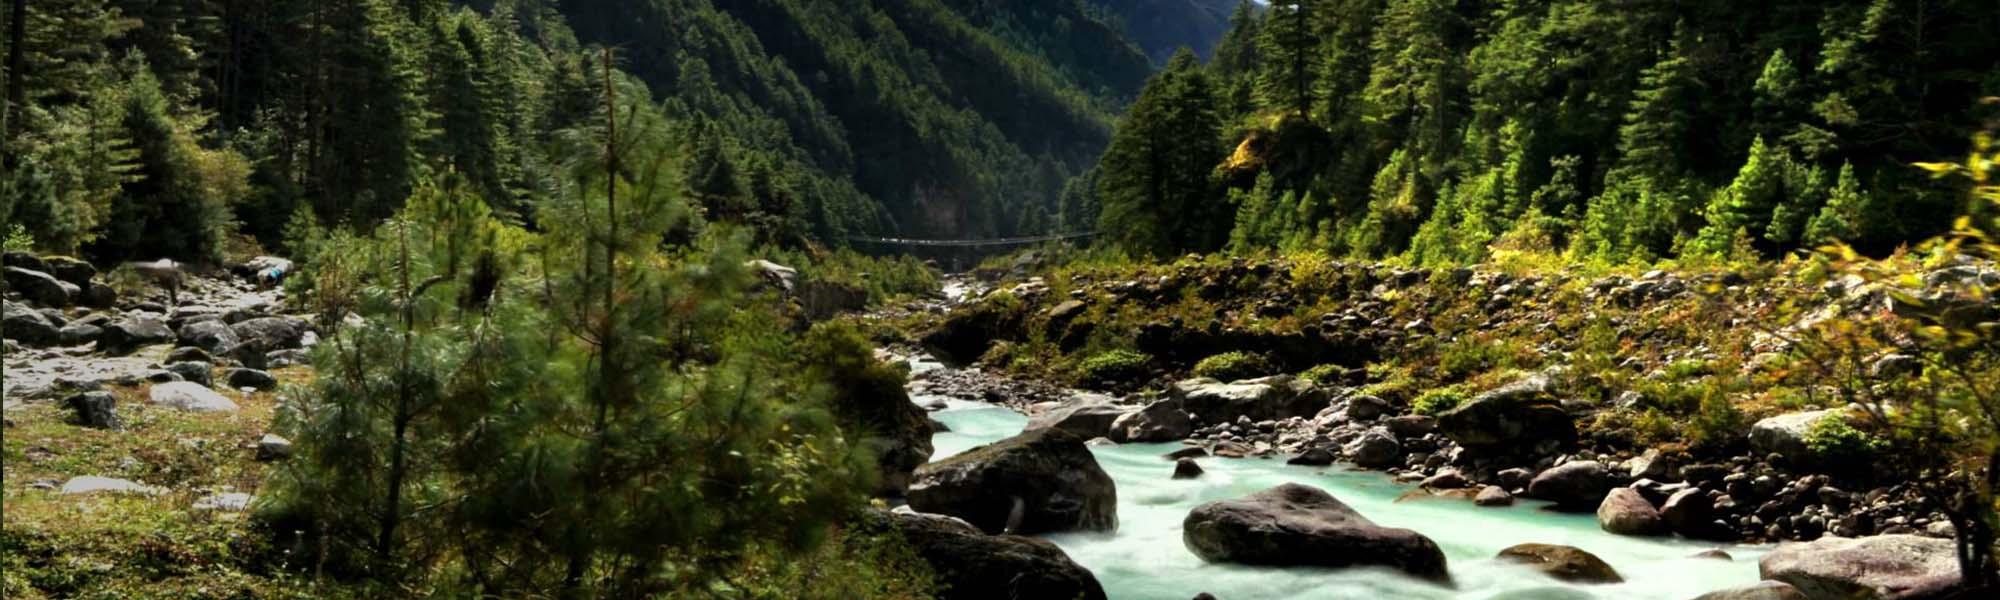 The Bhutan Himalayan Valley